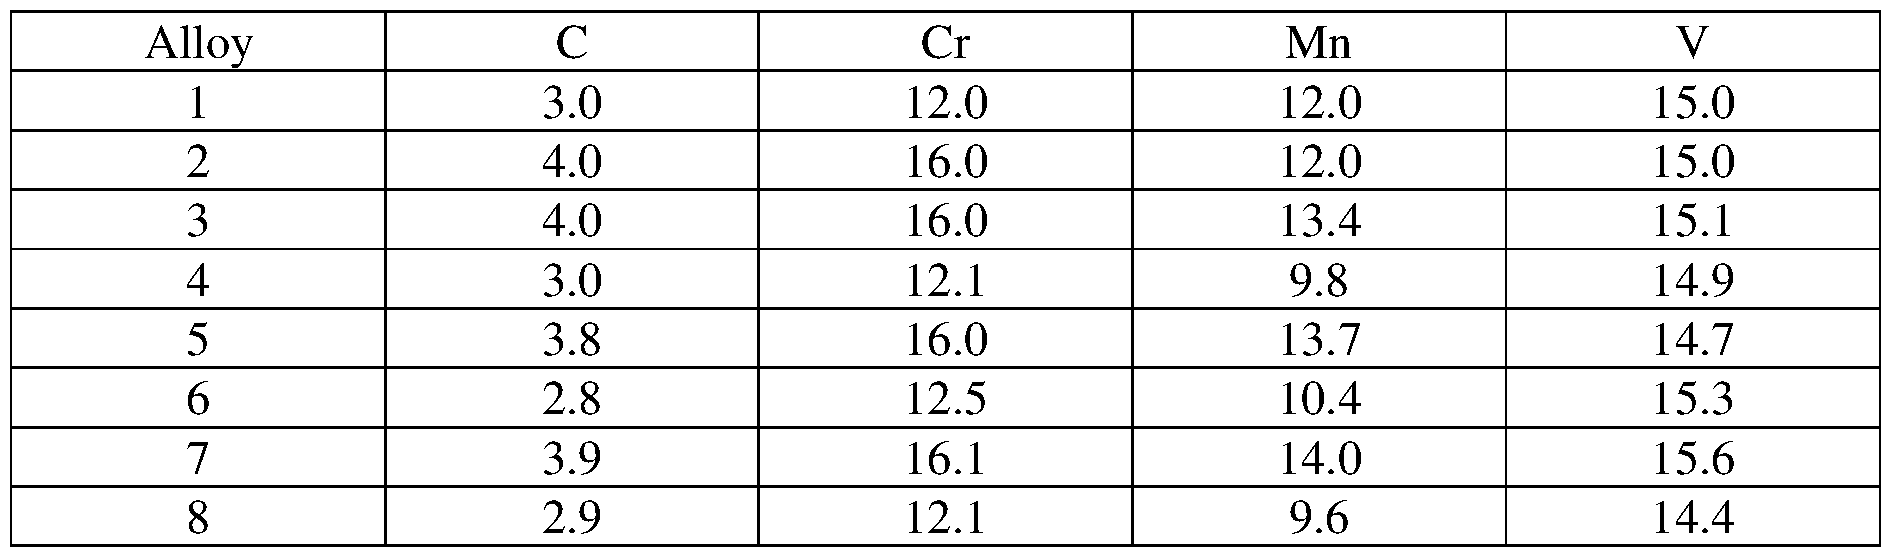 WO2017044475A1 - Non-magnetic cdb5283d4d32